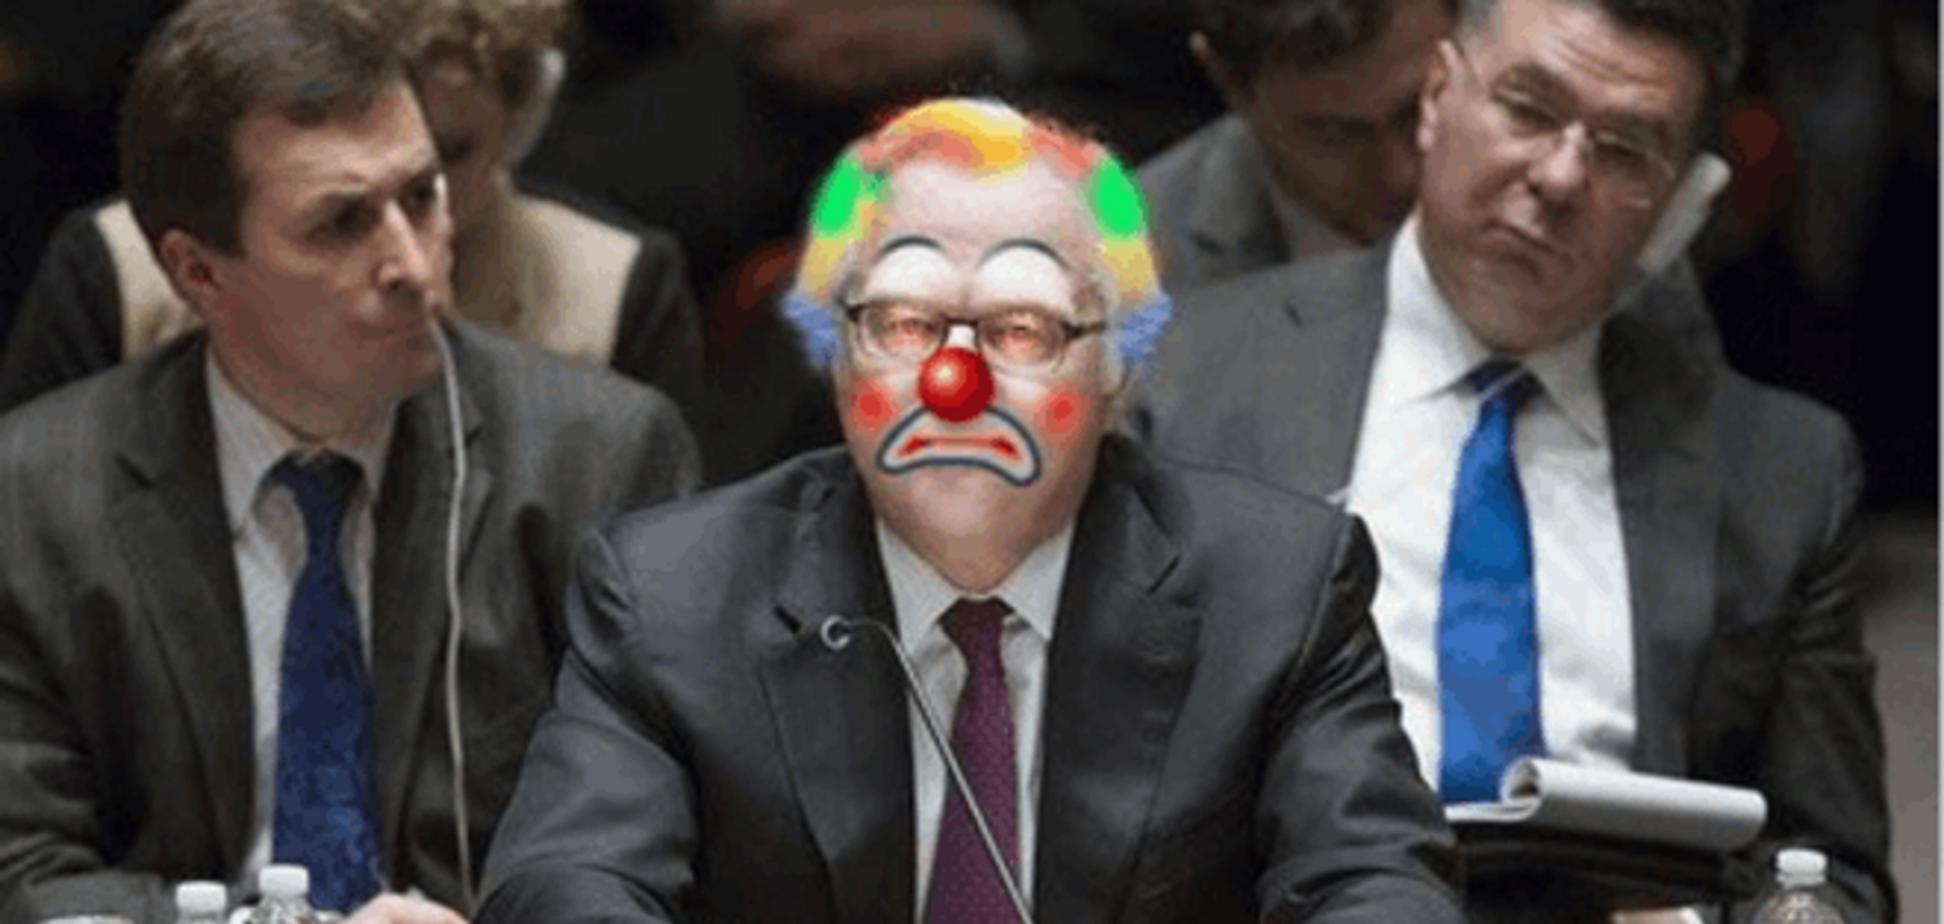 'На арене клоун Чуркин': соцсети бурно отреагировали на заседание Совбеза ООН